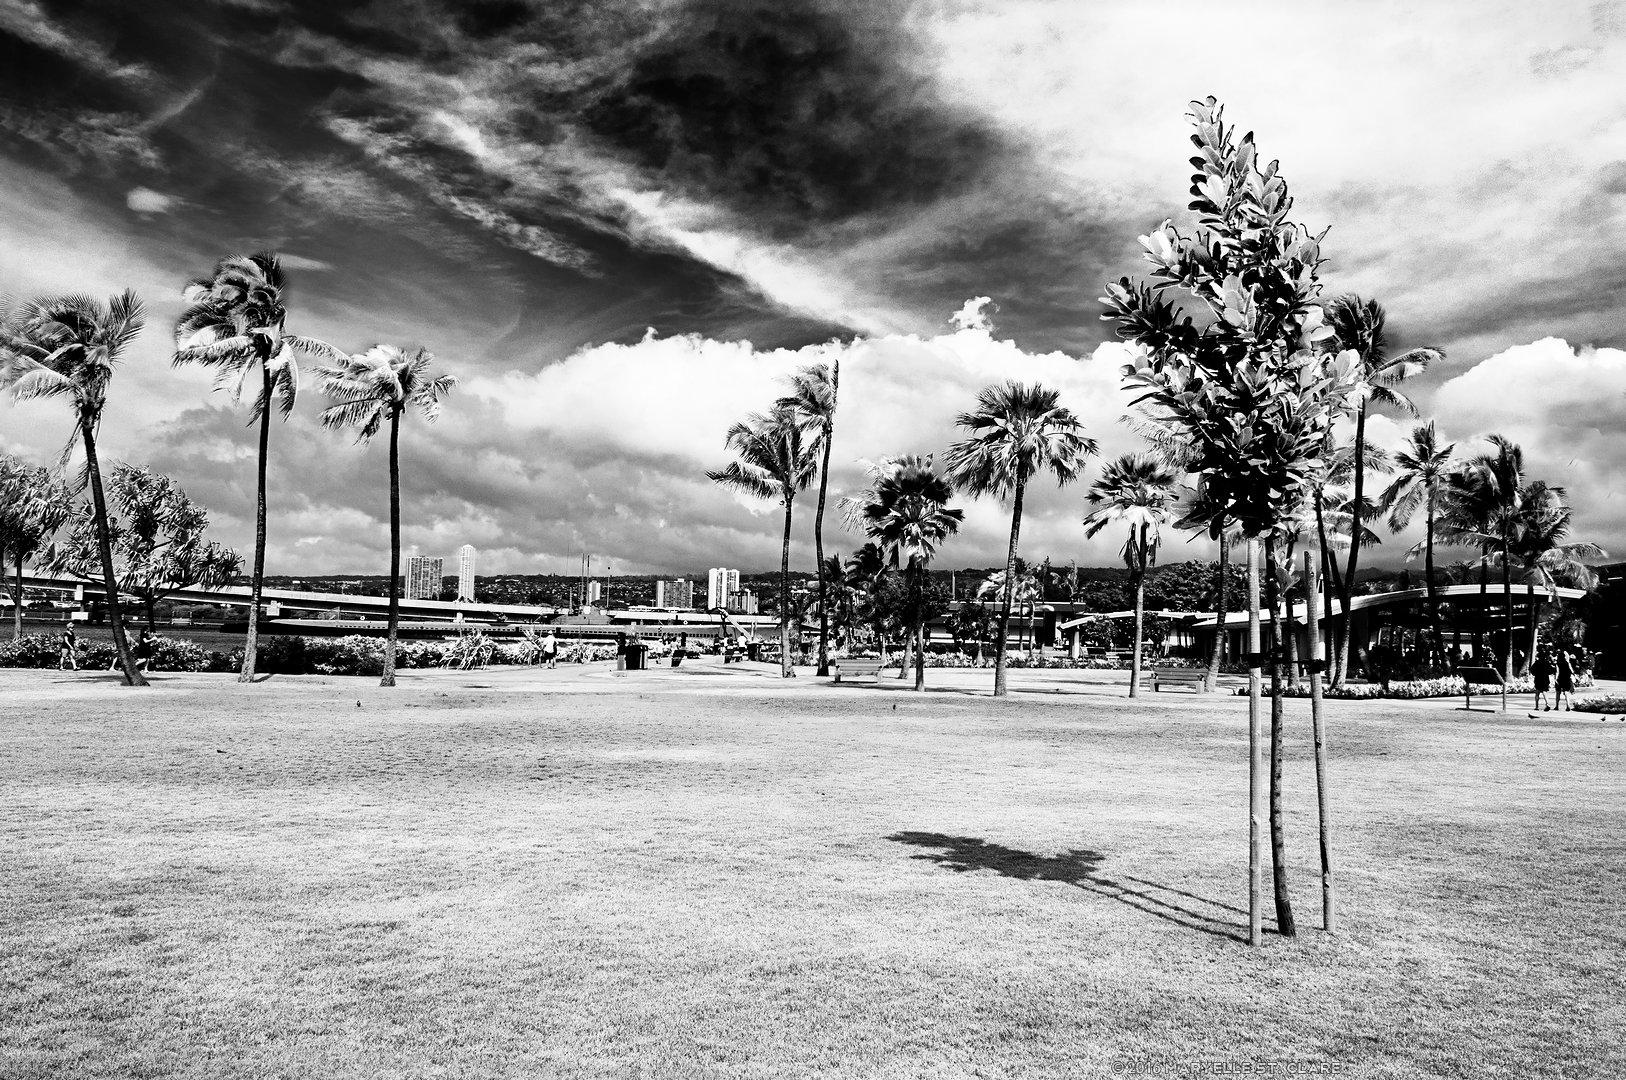 Arizona Memorial. Pearl Harbor, Honolulu, Hawaii. 11 Nov 2011.